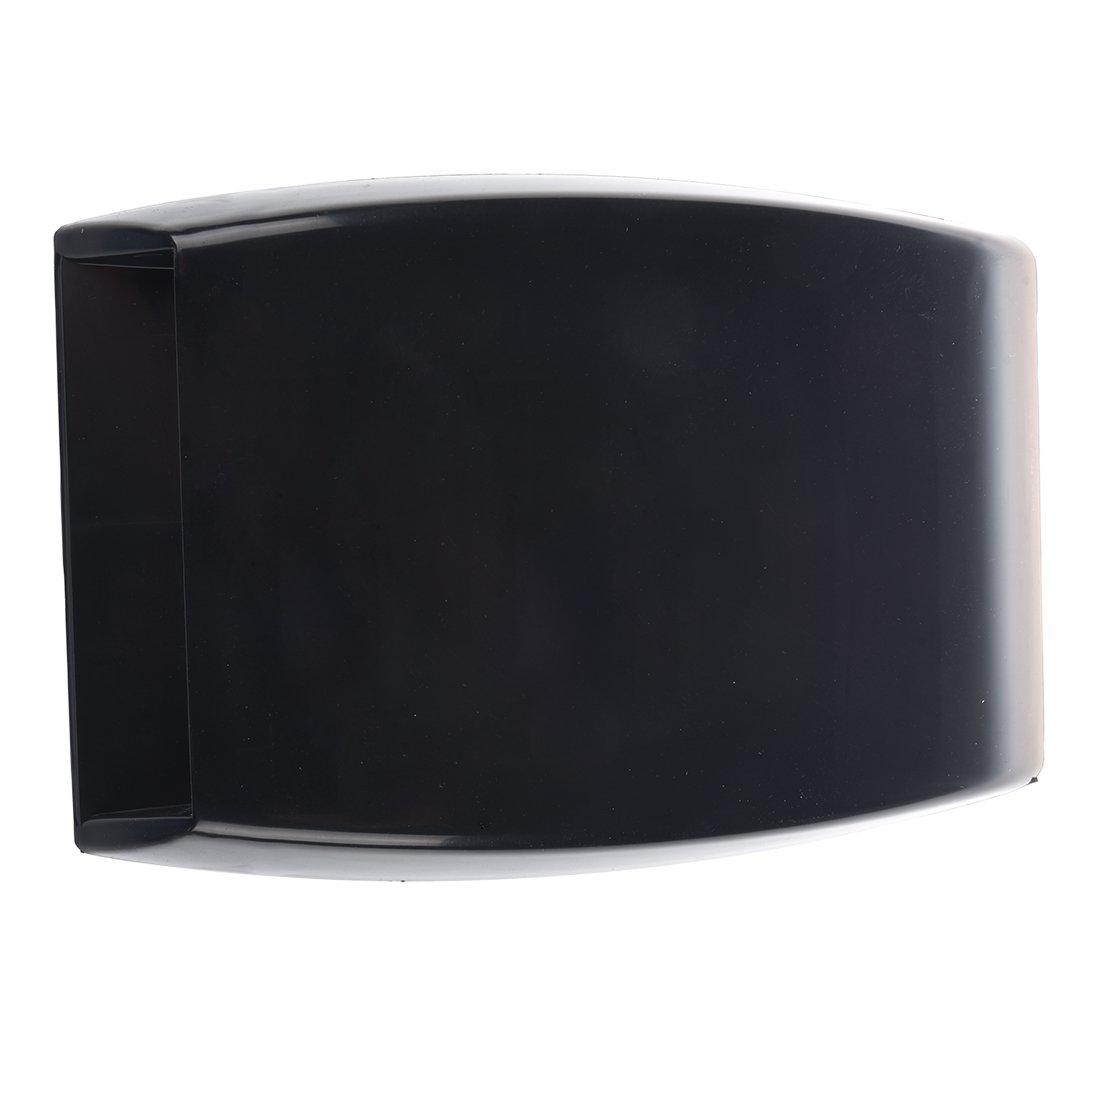 TOOGOO Respiradero de flujo de aire universal capilla de toma de aire de coche Negro con malla R